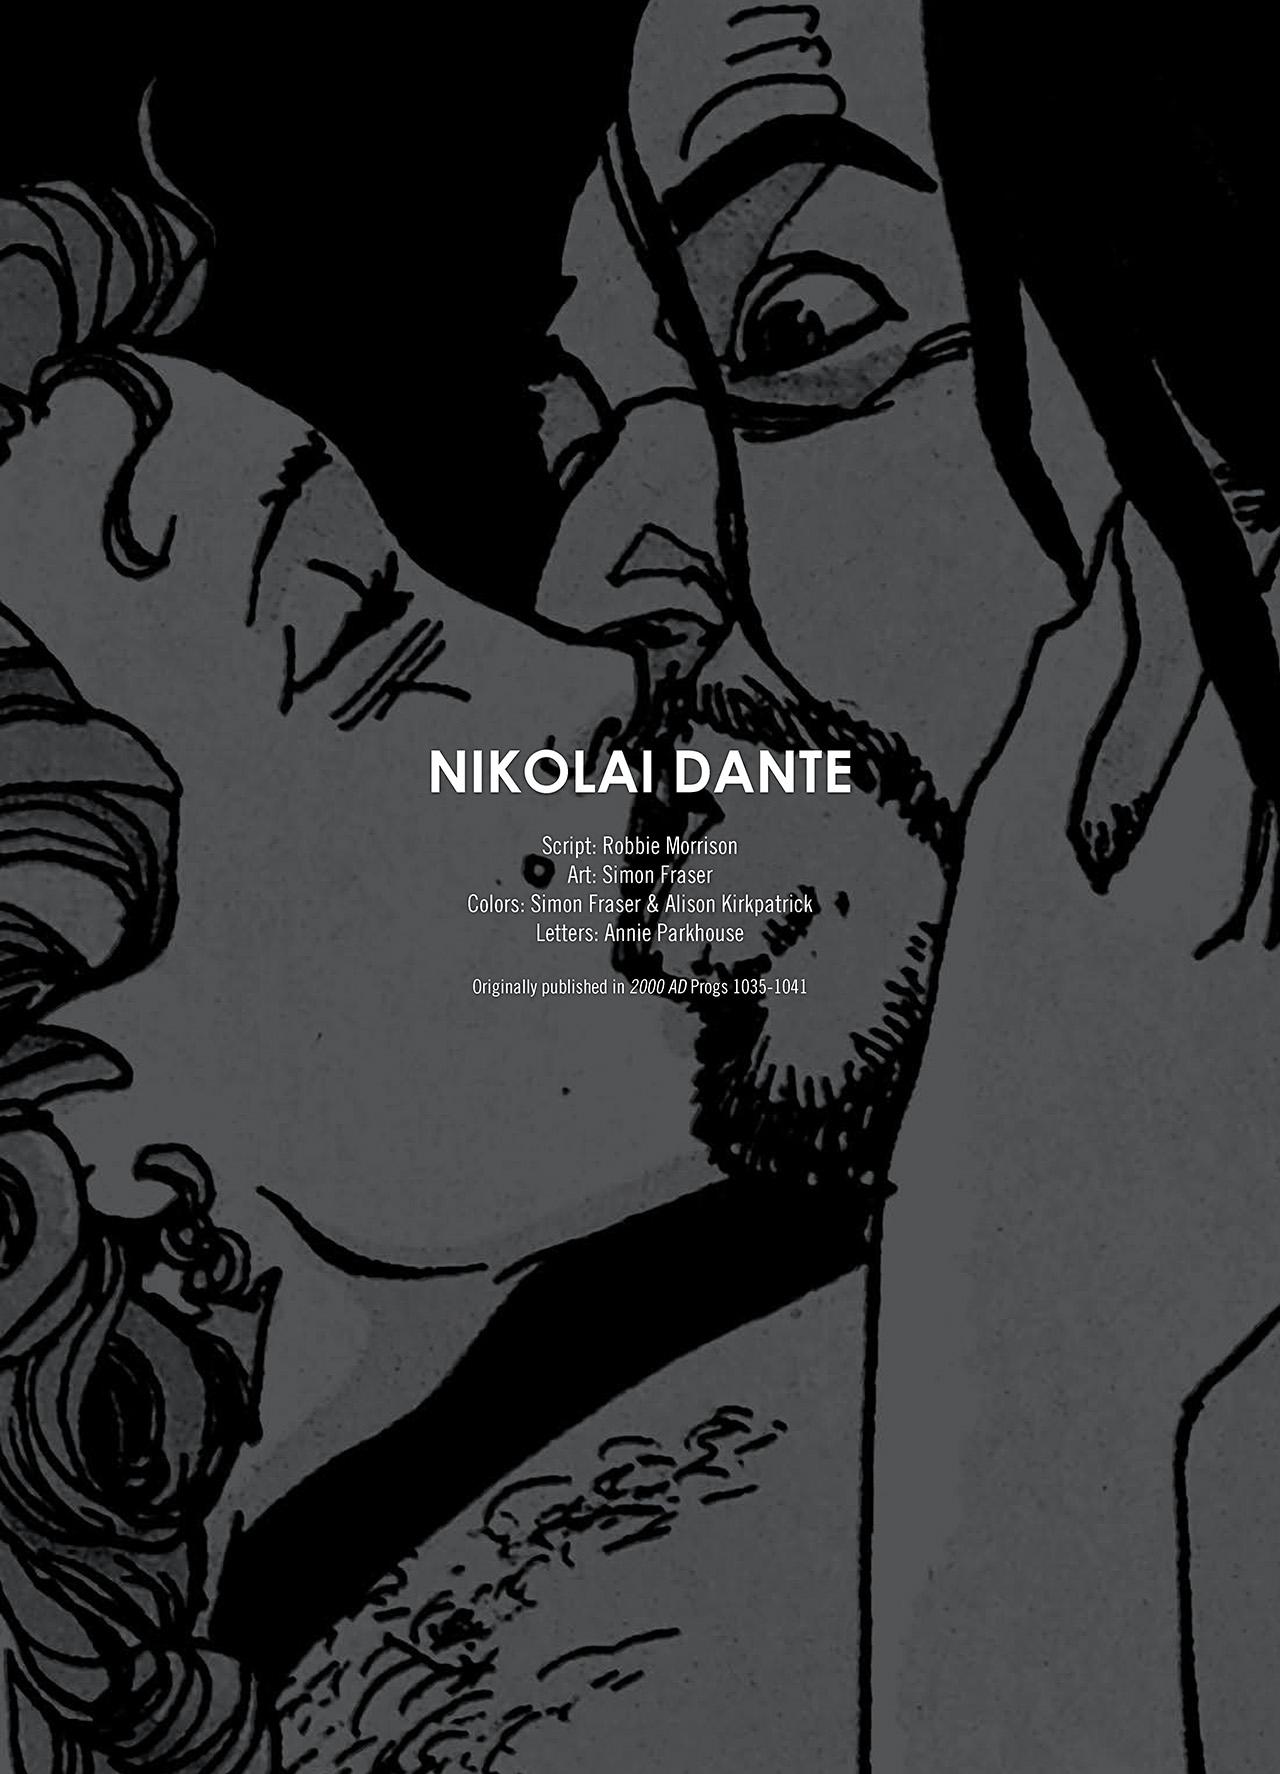 Read online Nikolai Dante comic -  Issue # TPB 1 - 5